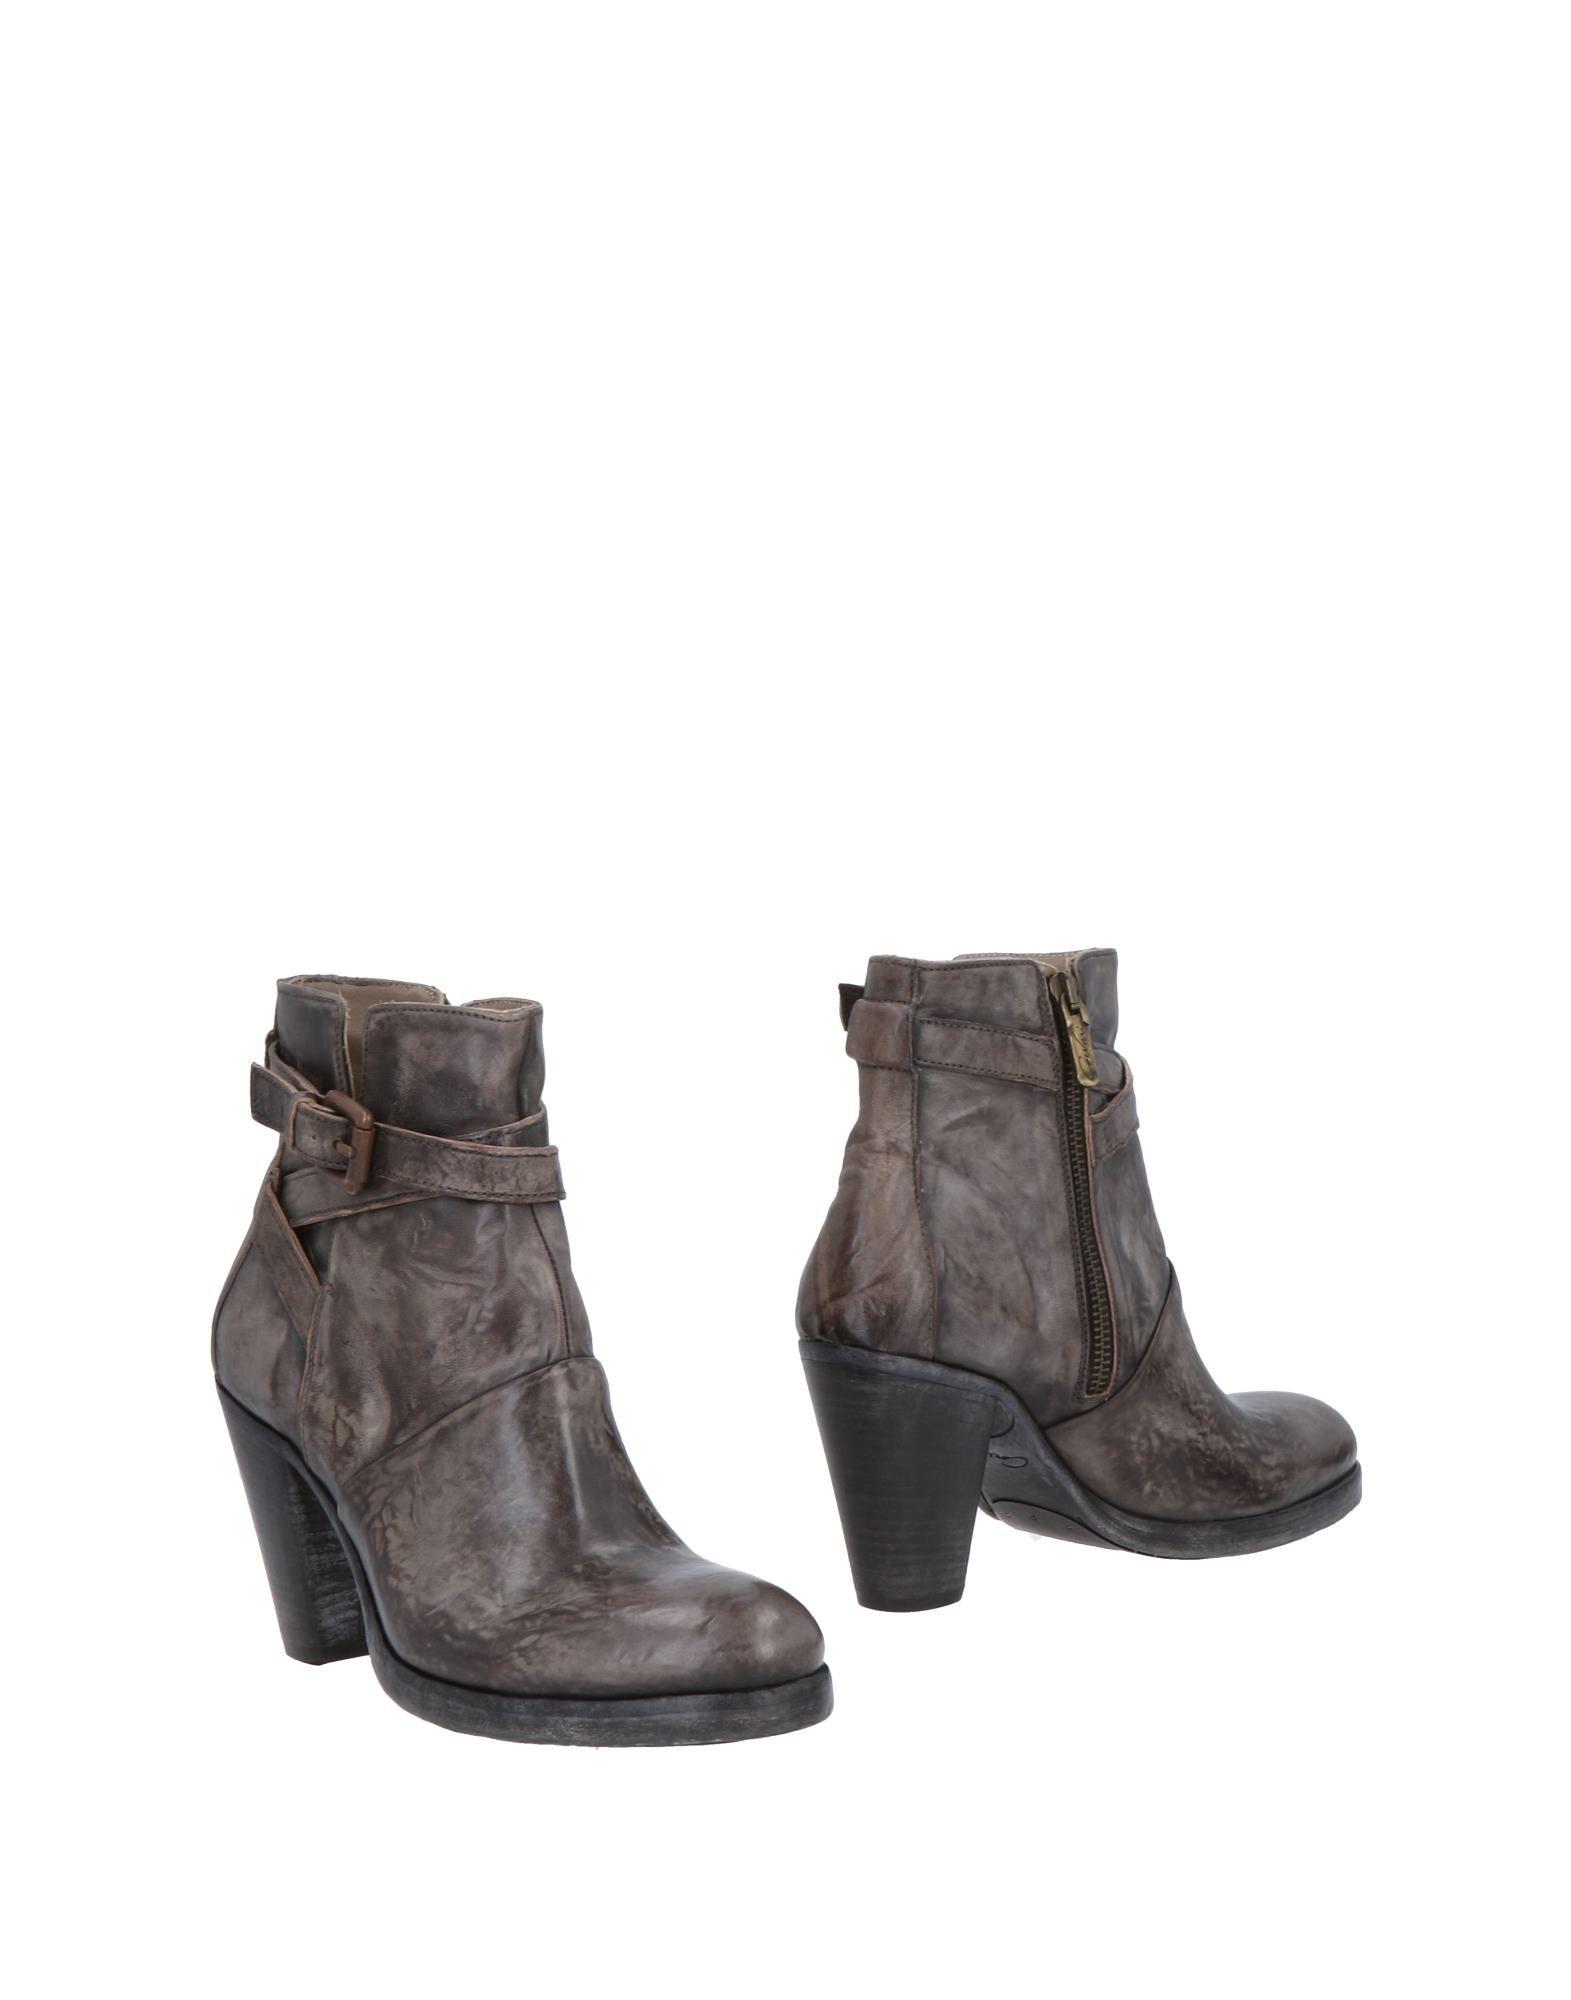 Corvari Stiefelette Damen Schuhe  11501525QLGut aussehende strapazierfähige Schuhe Damen c622e6